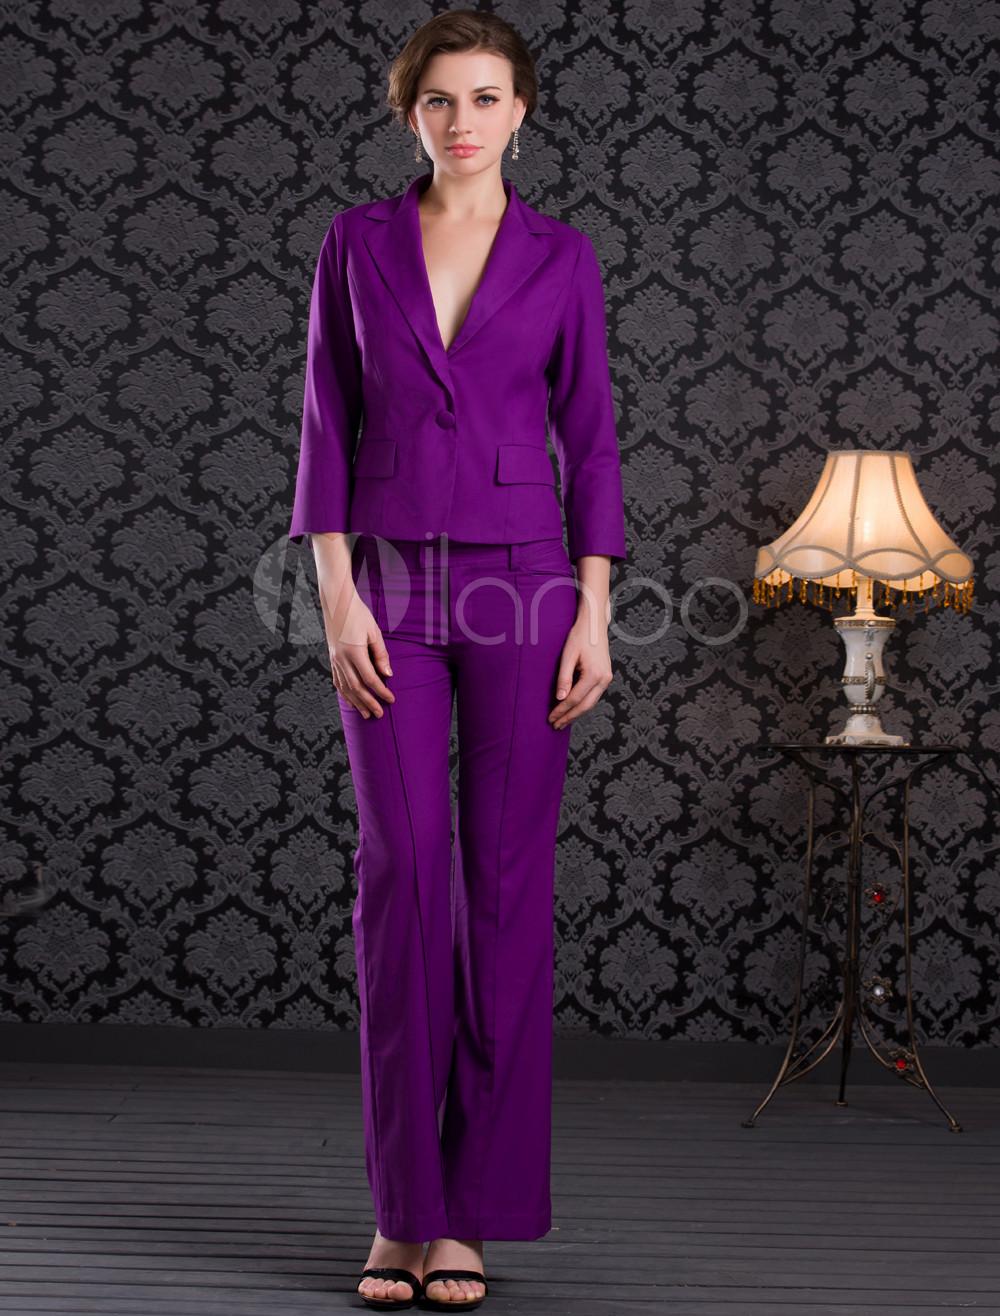 Deep Purple Buttons Polyester Pant Suit Lesbian Wedding Attire